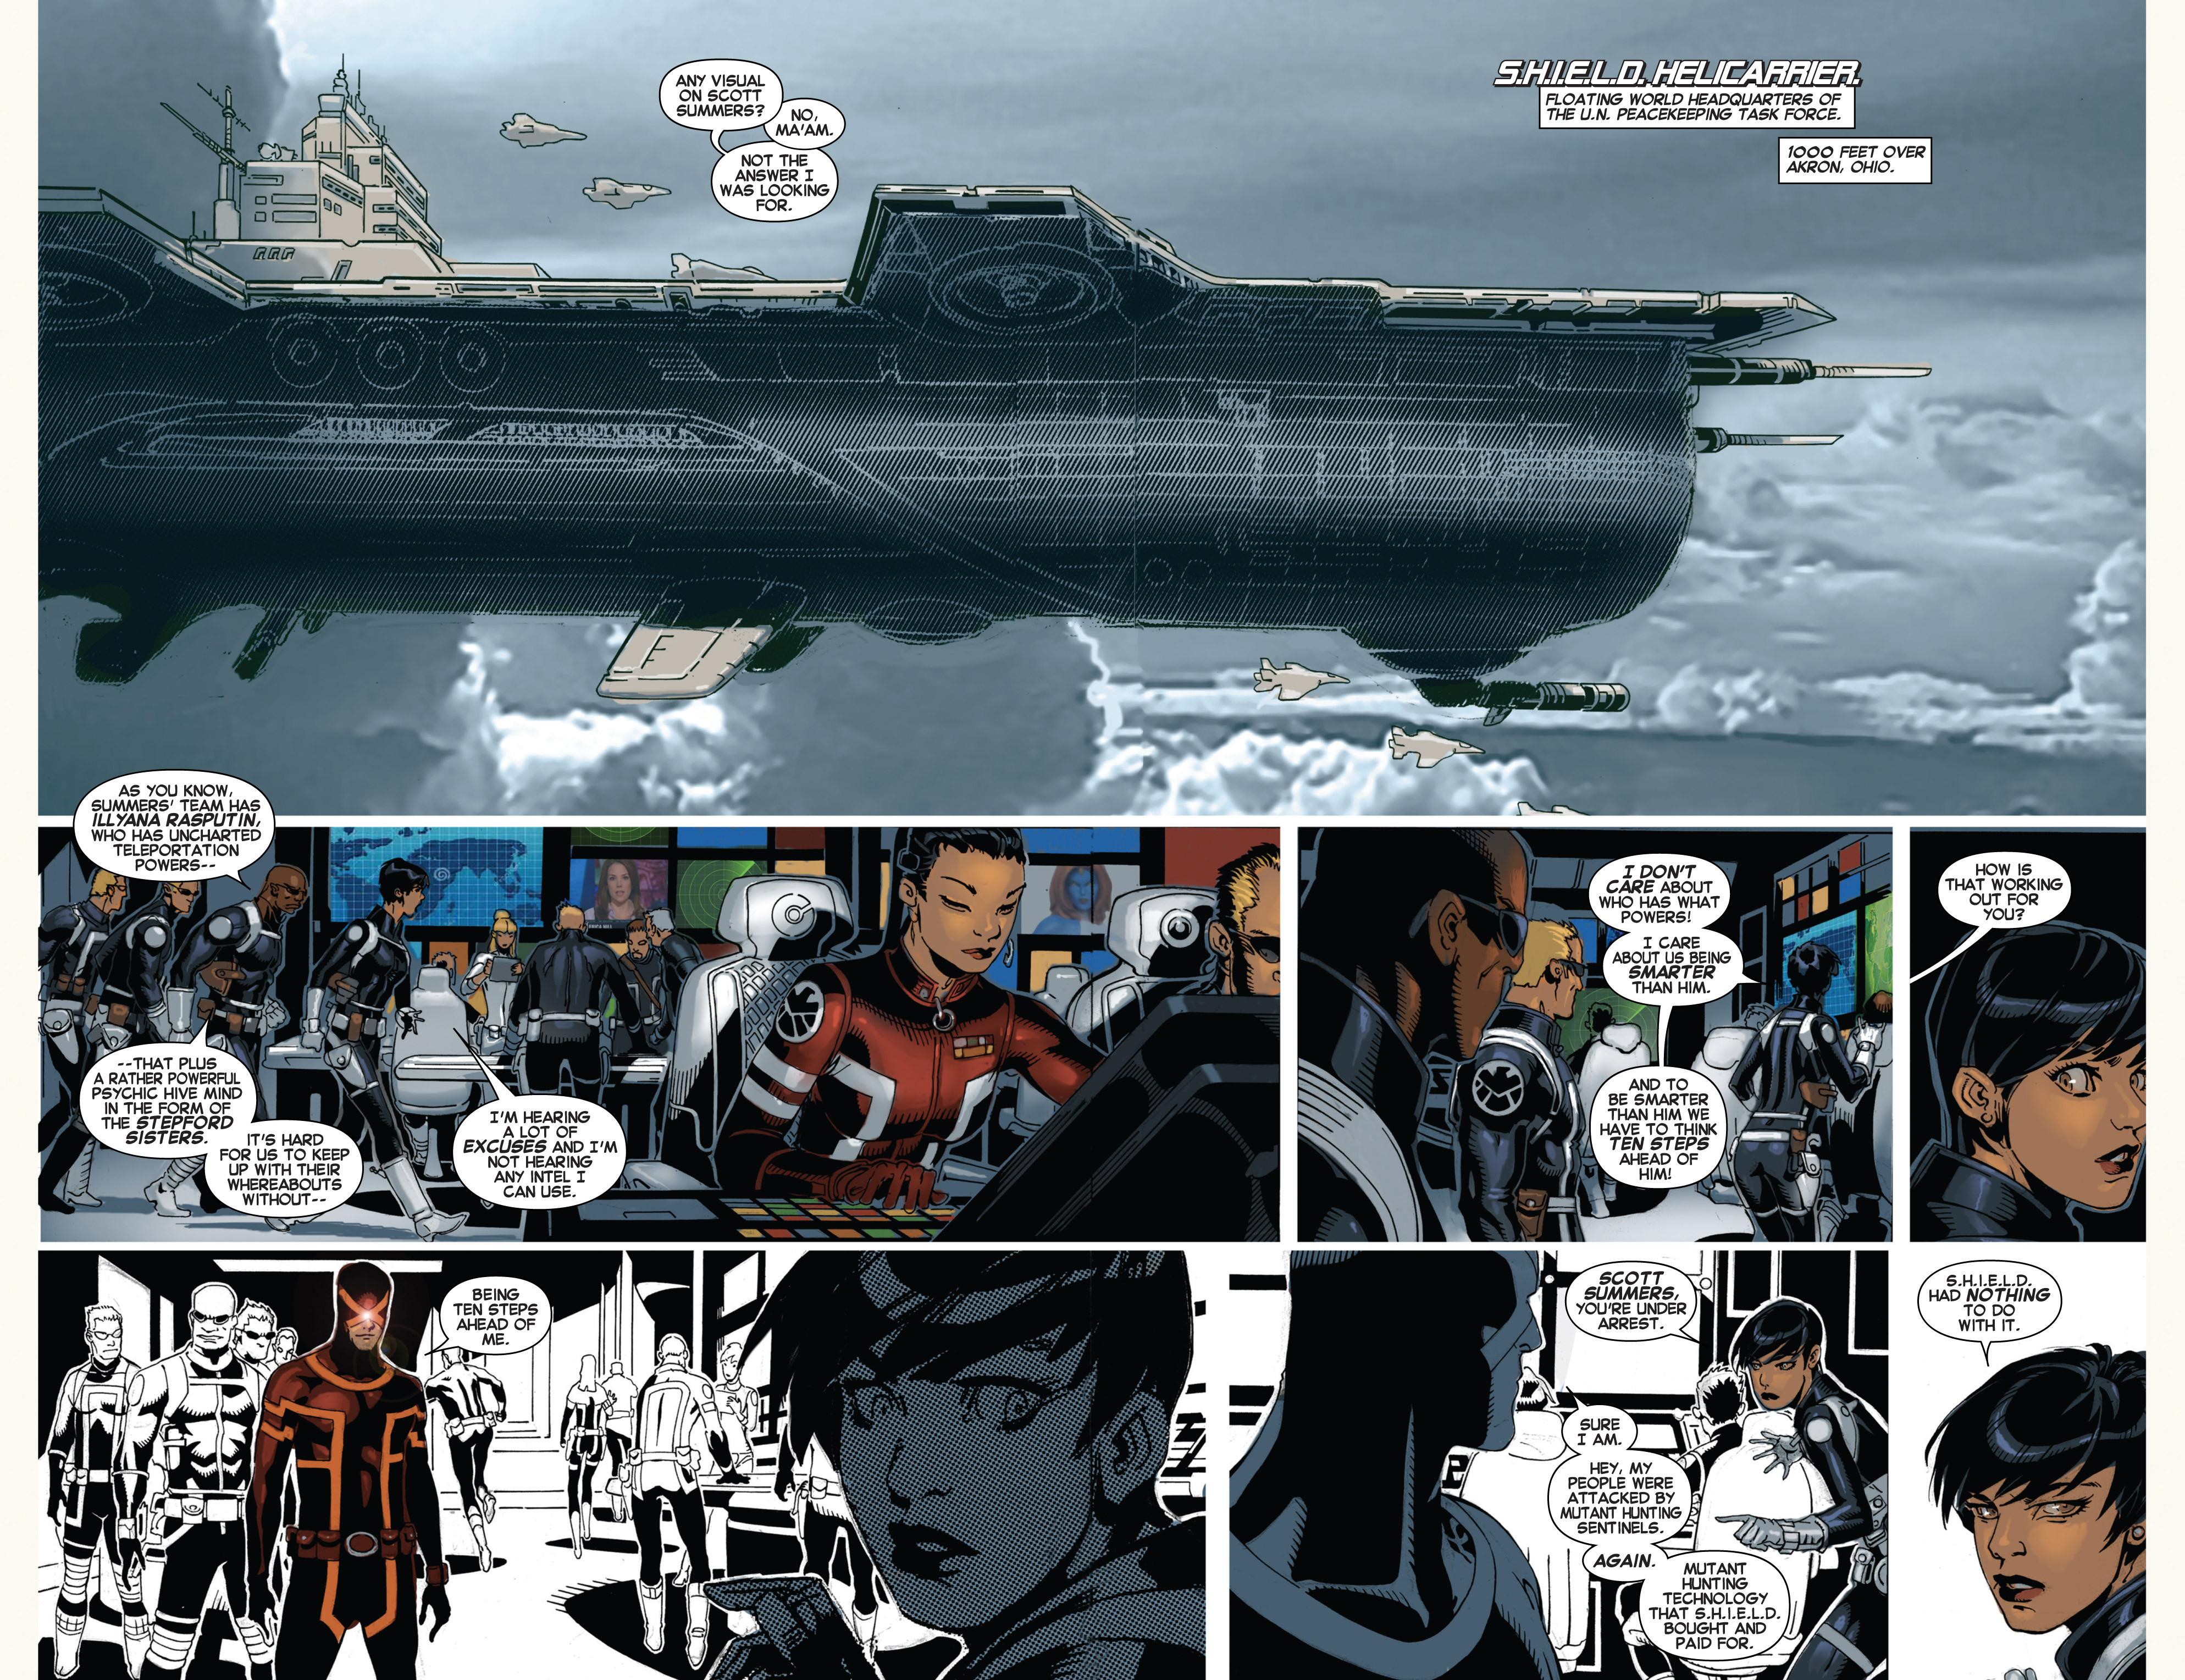 Read online Uncanny X-Men (2013) comic -  Issue # _TPB 4 - vs. S.H.I.E.L.D - 25